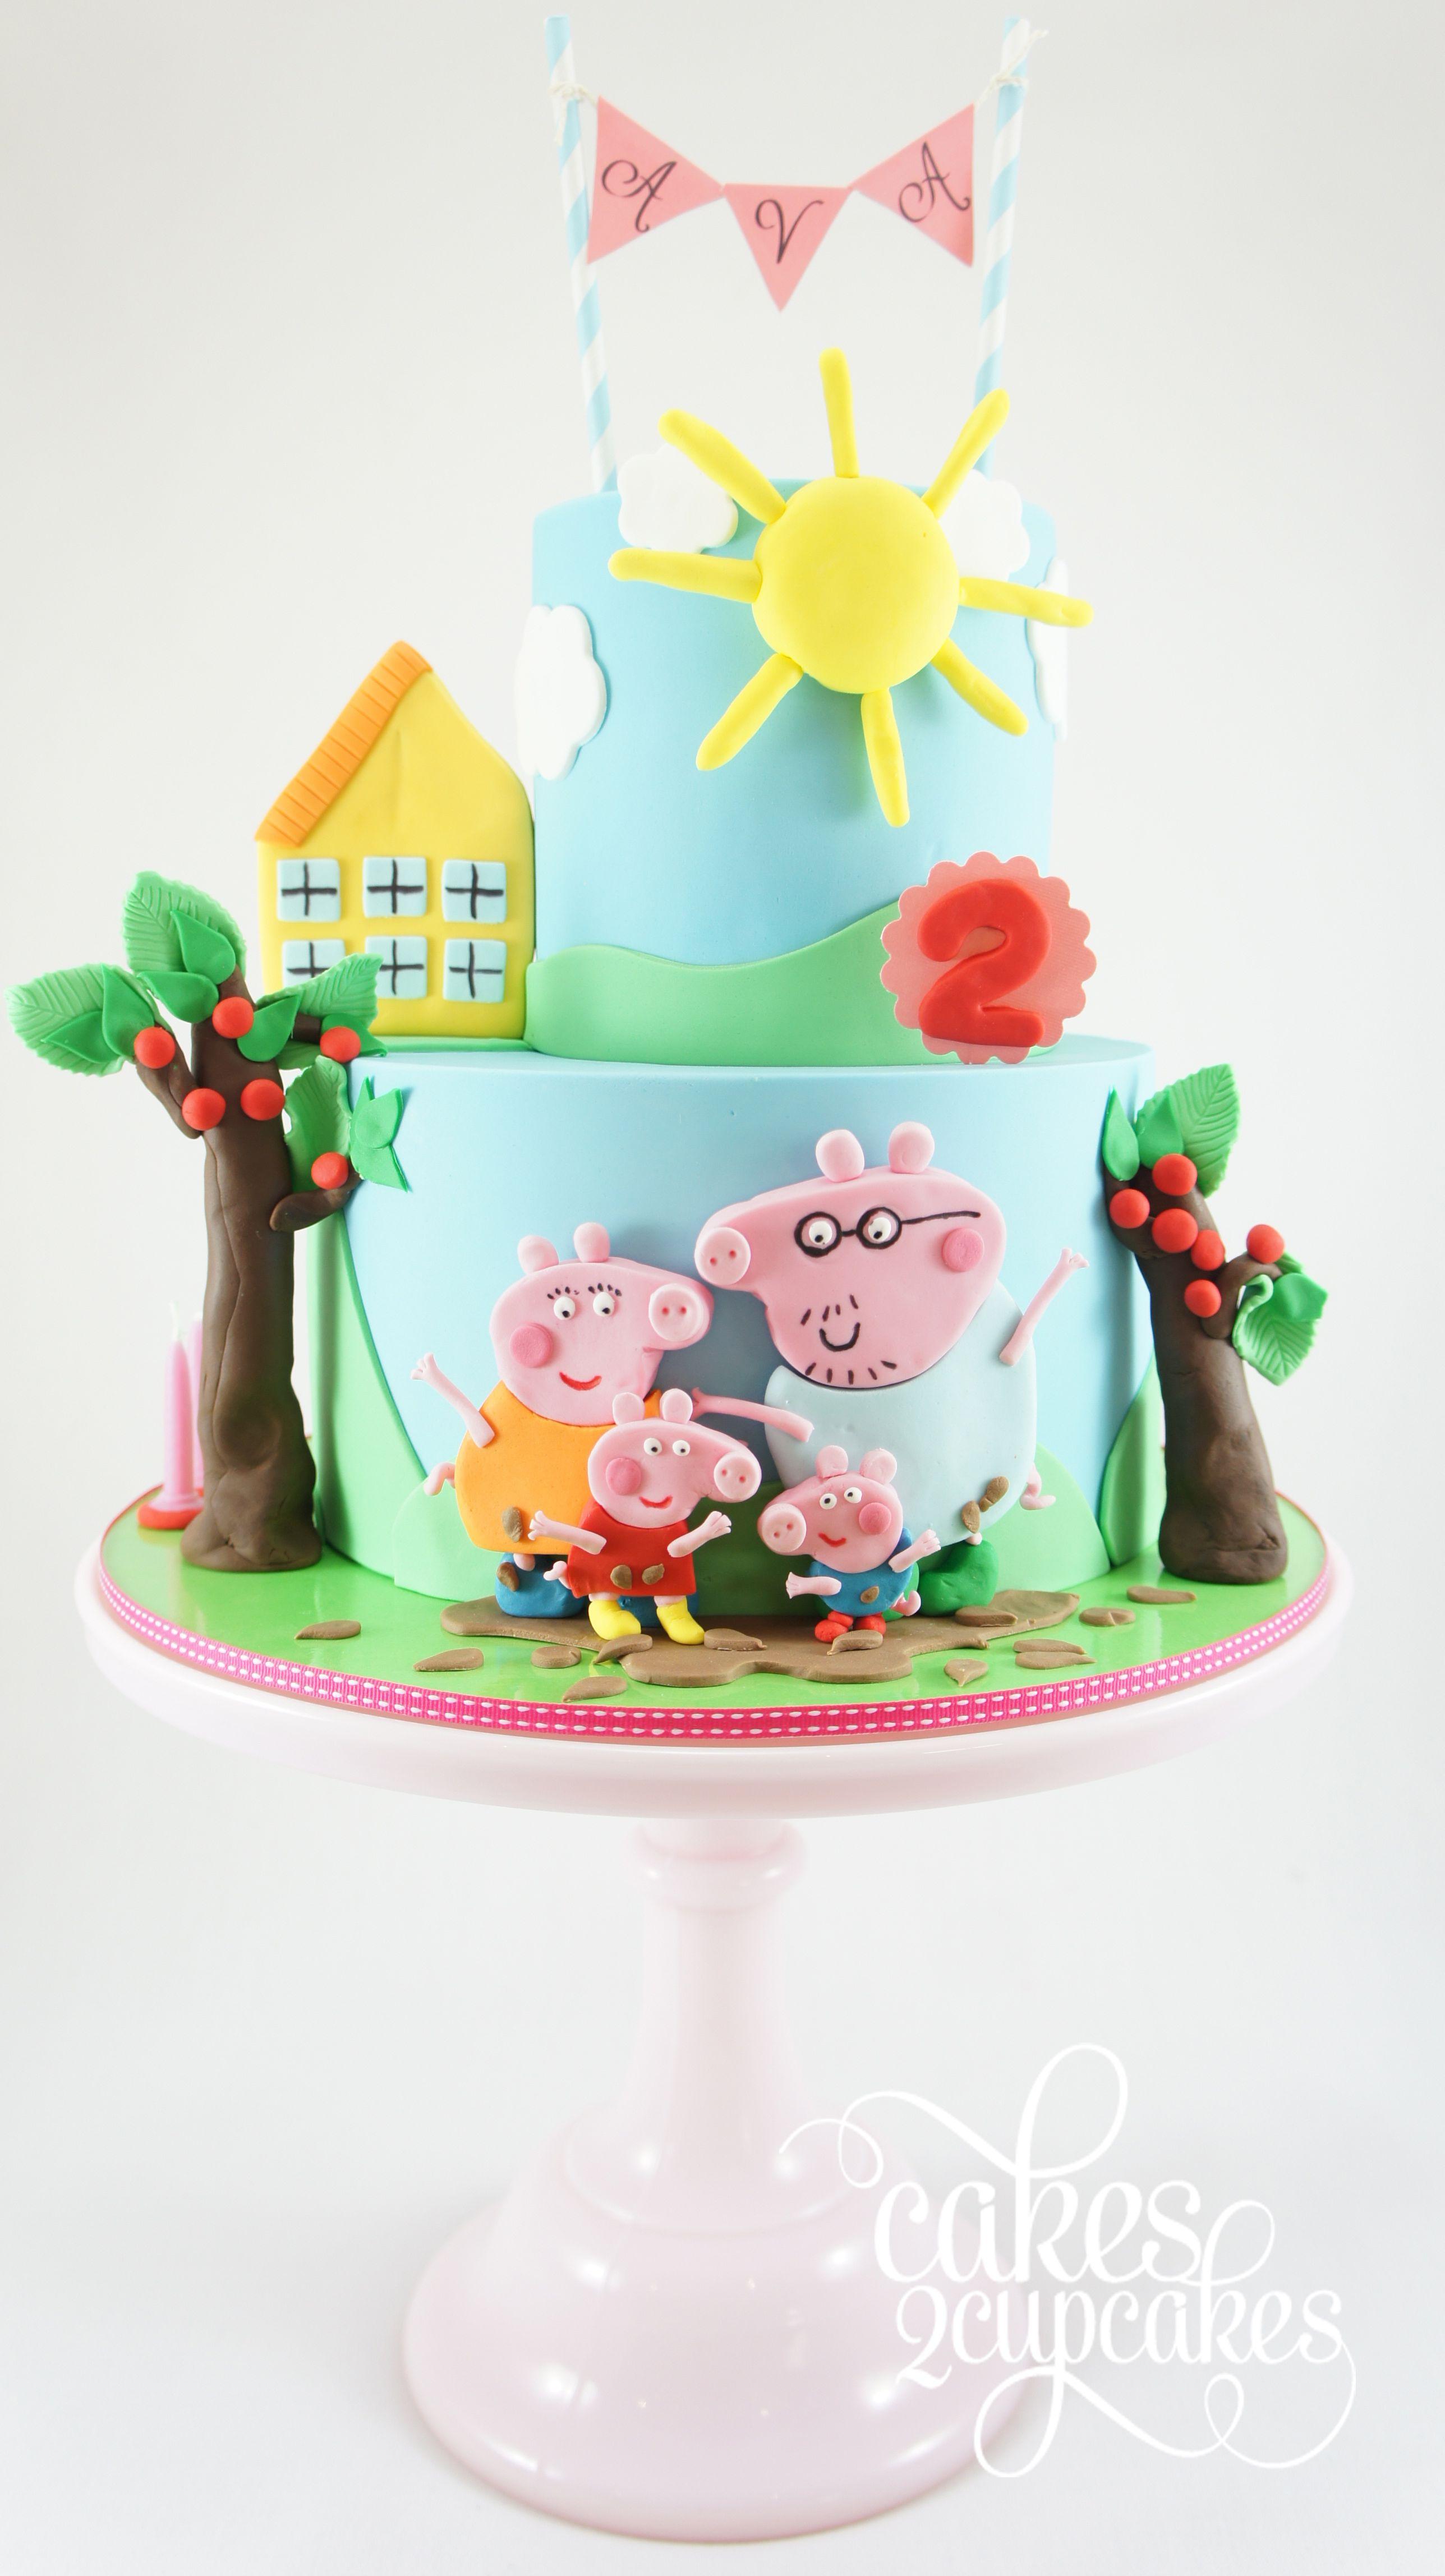 cakes2cupcakes-peppa-pig.jpg